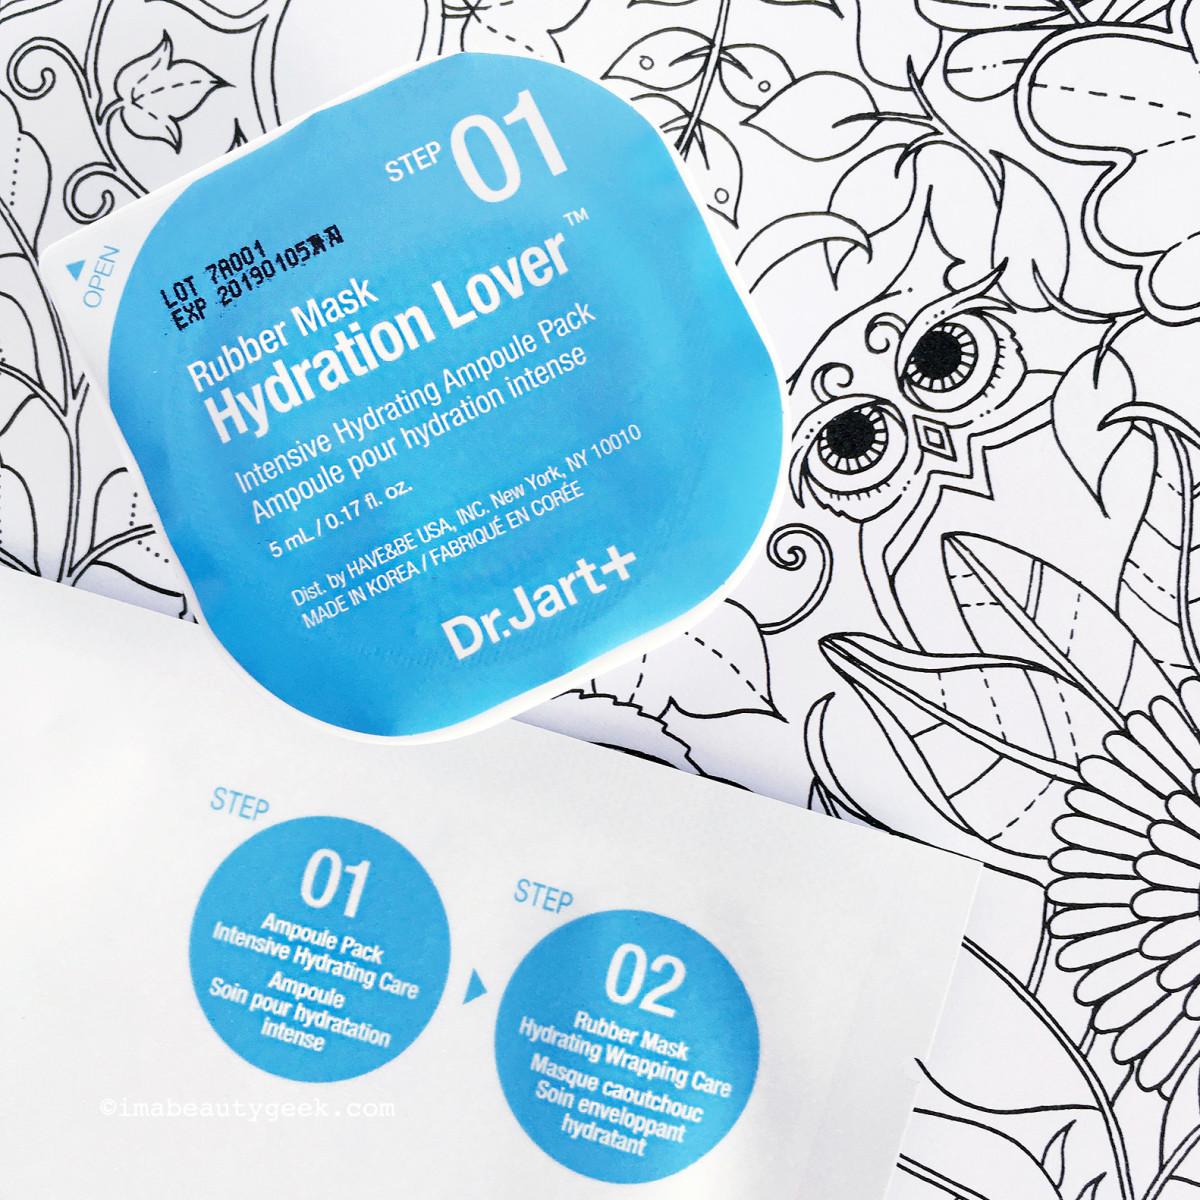 Dr. Jart Hydration Lover Rubber Mask: Step 1 ampoule